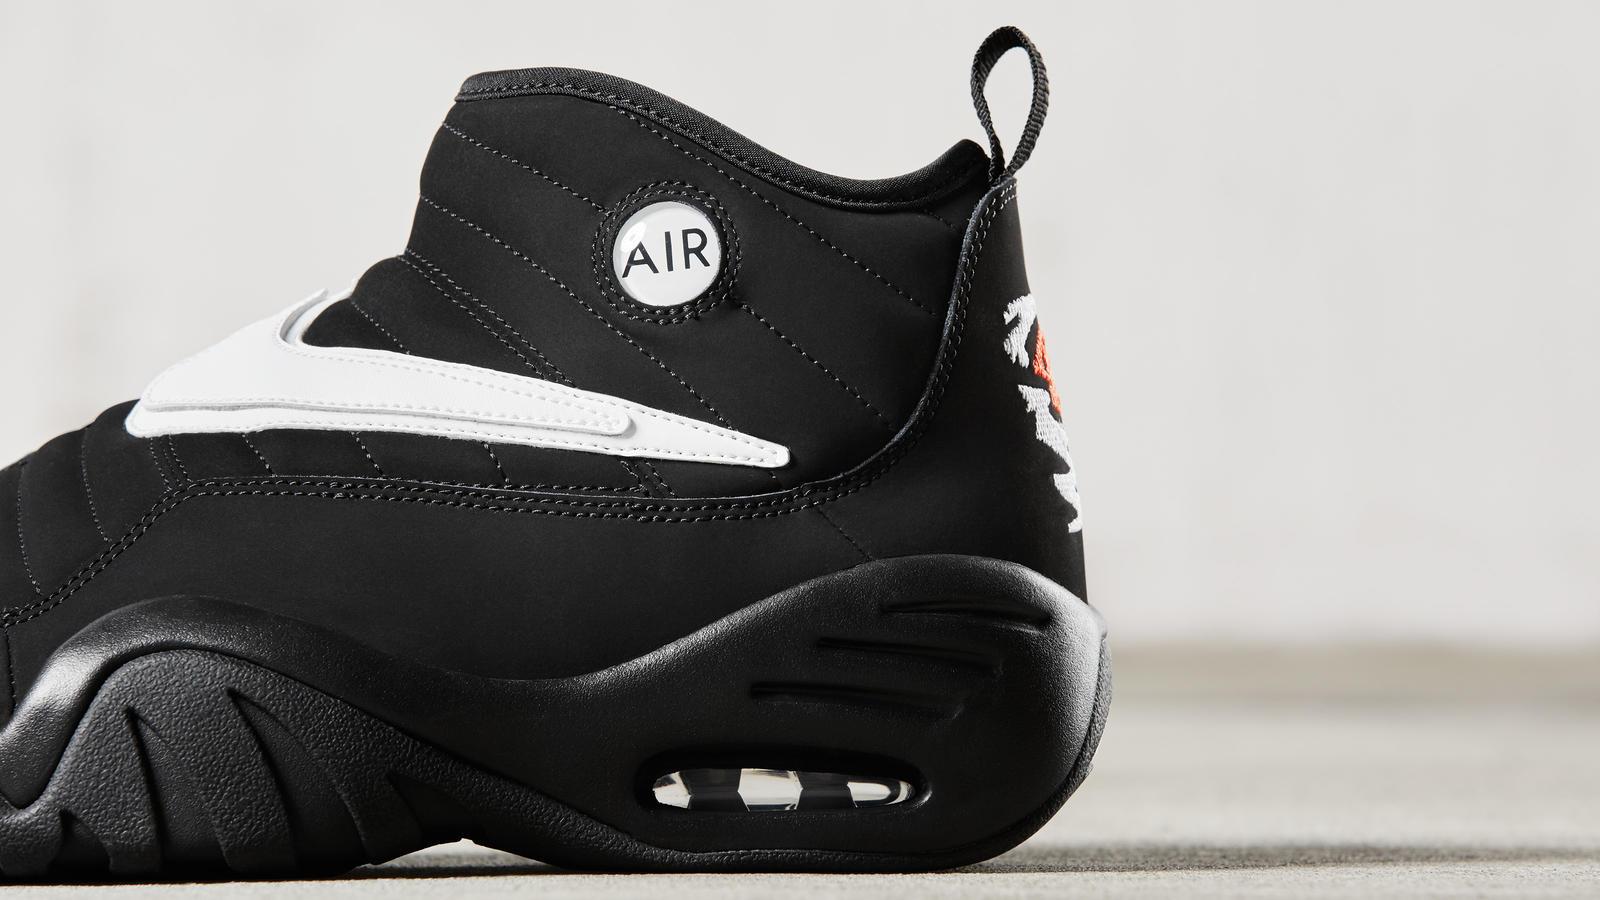 a4a8df23d28a NIKE-AIR-SHAKE-NDESTRUKT-Black-2 - WearTesters